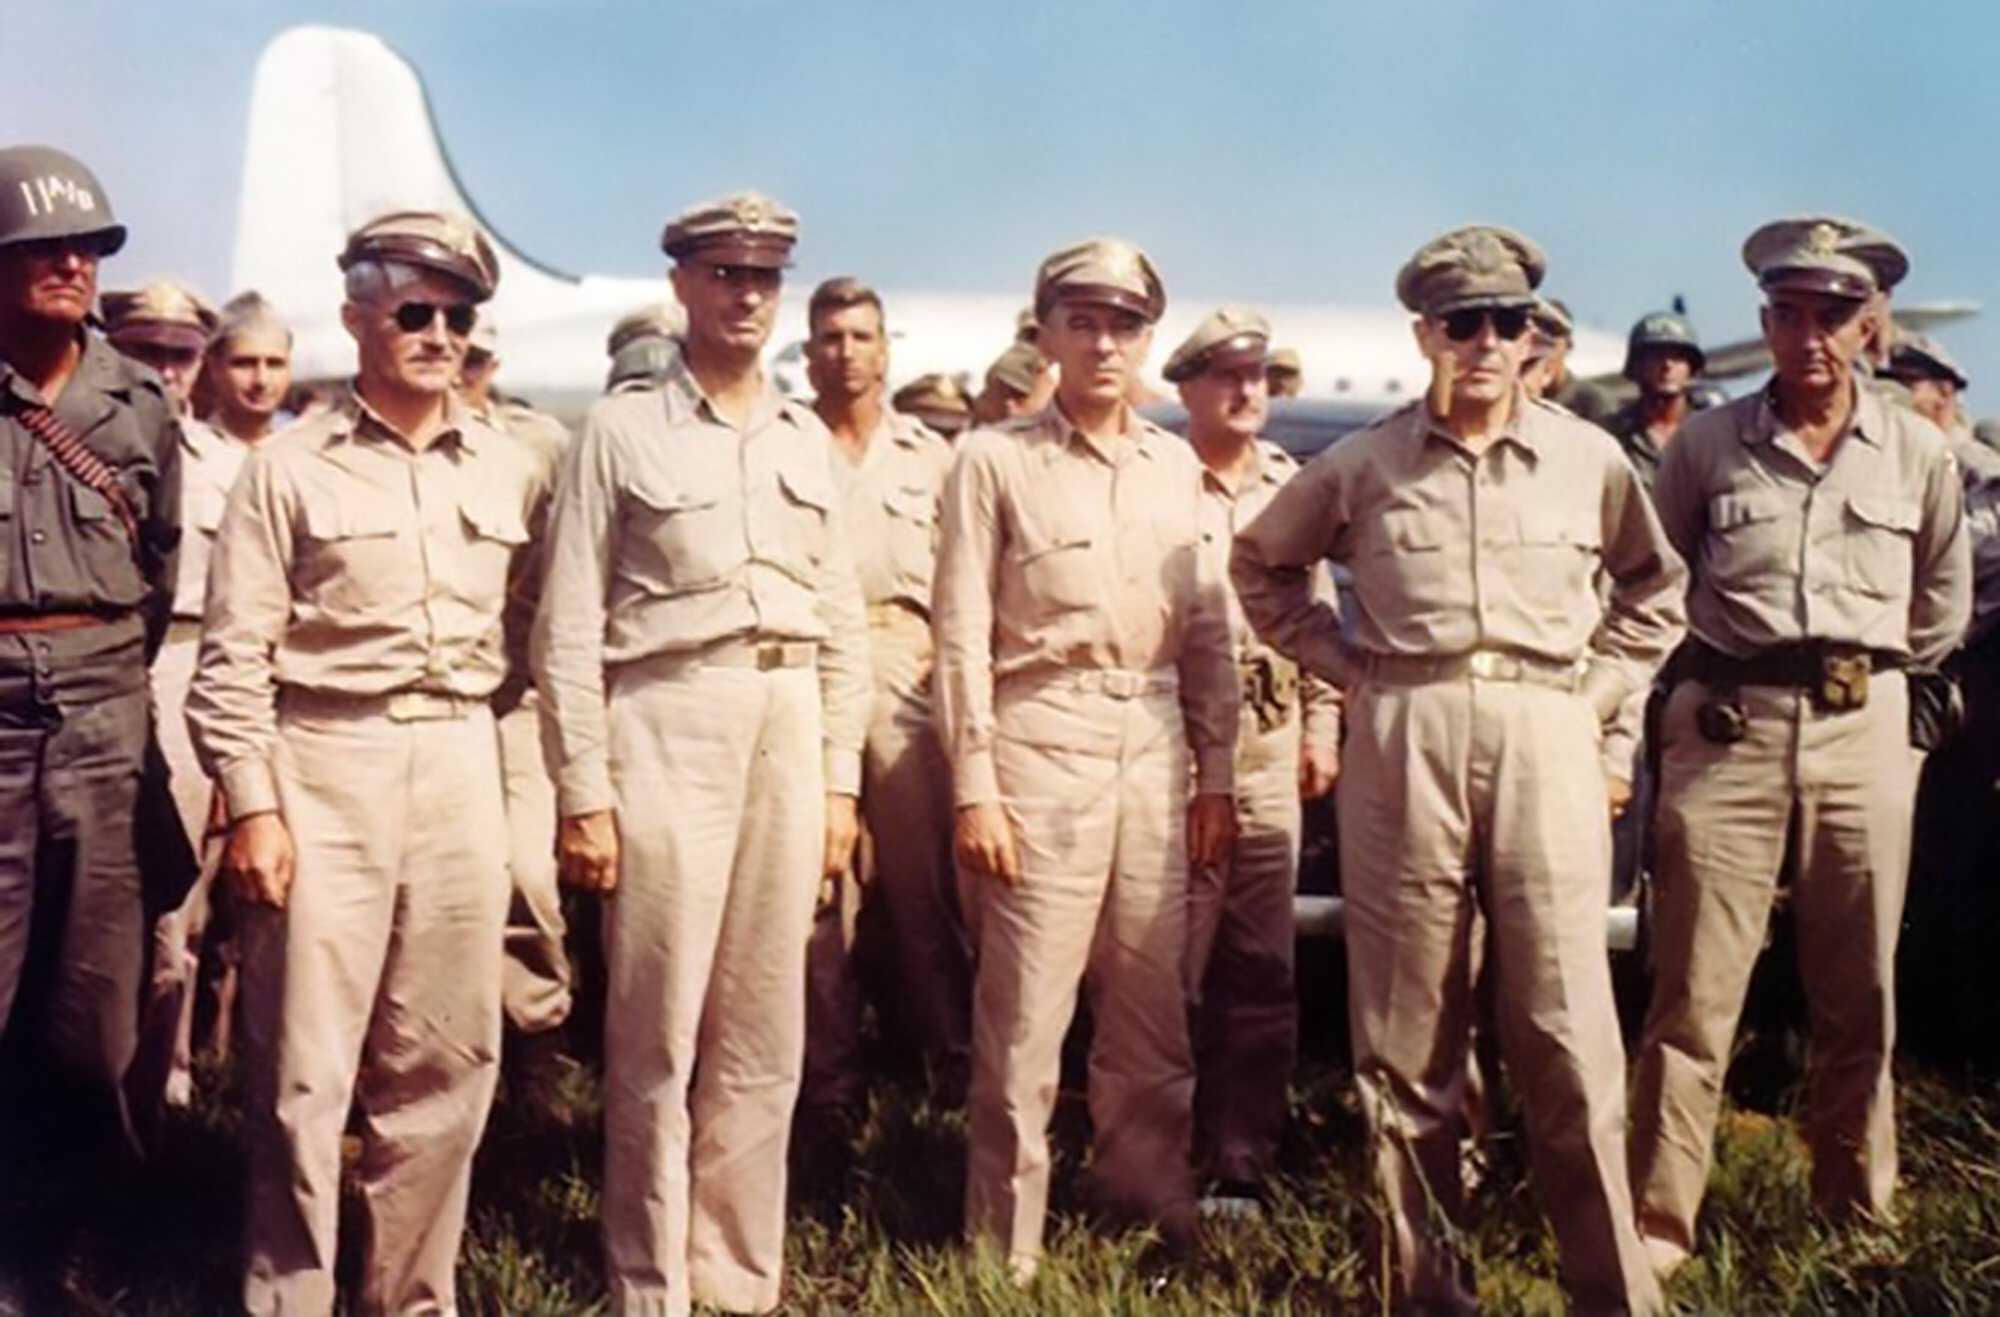 MacArthur_and_Sutherland-Tokyo-Trials-U.S.-Natinal-Archives.jpg